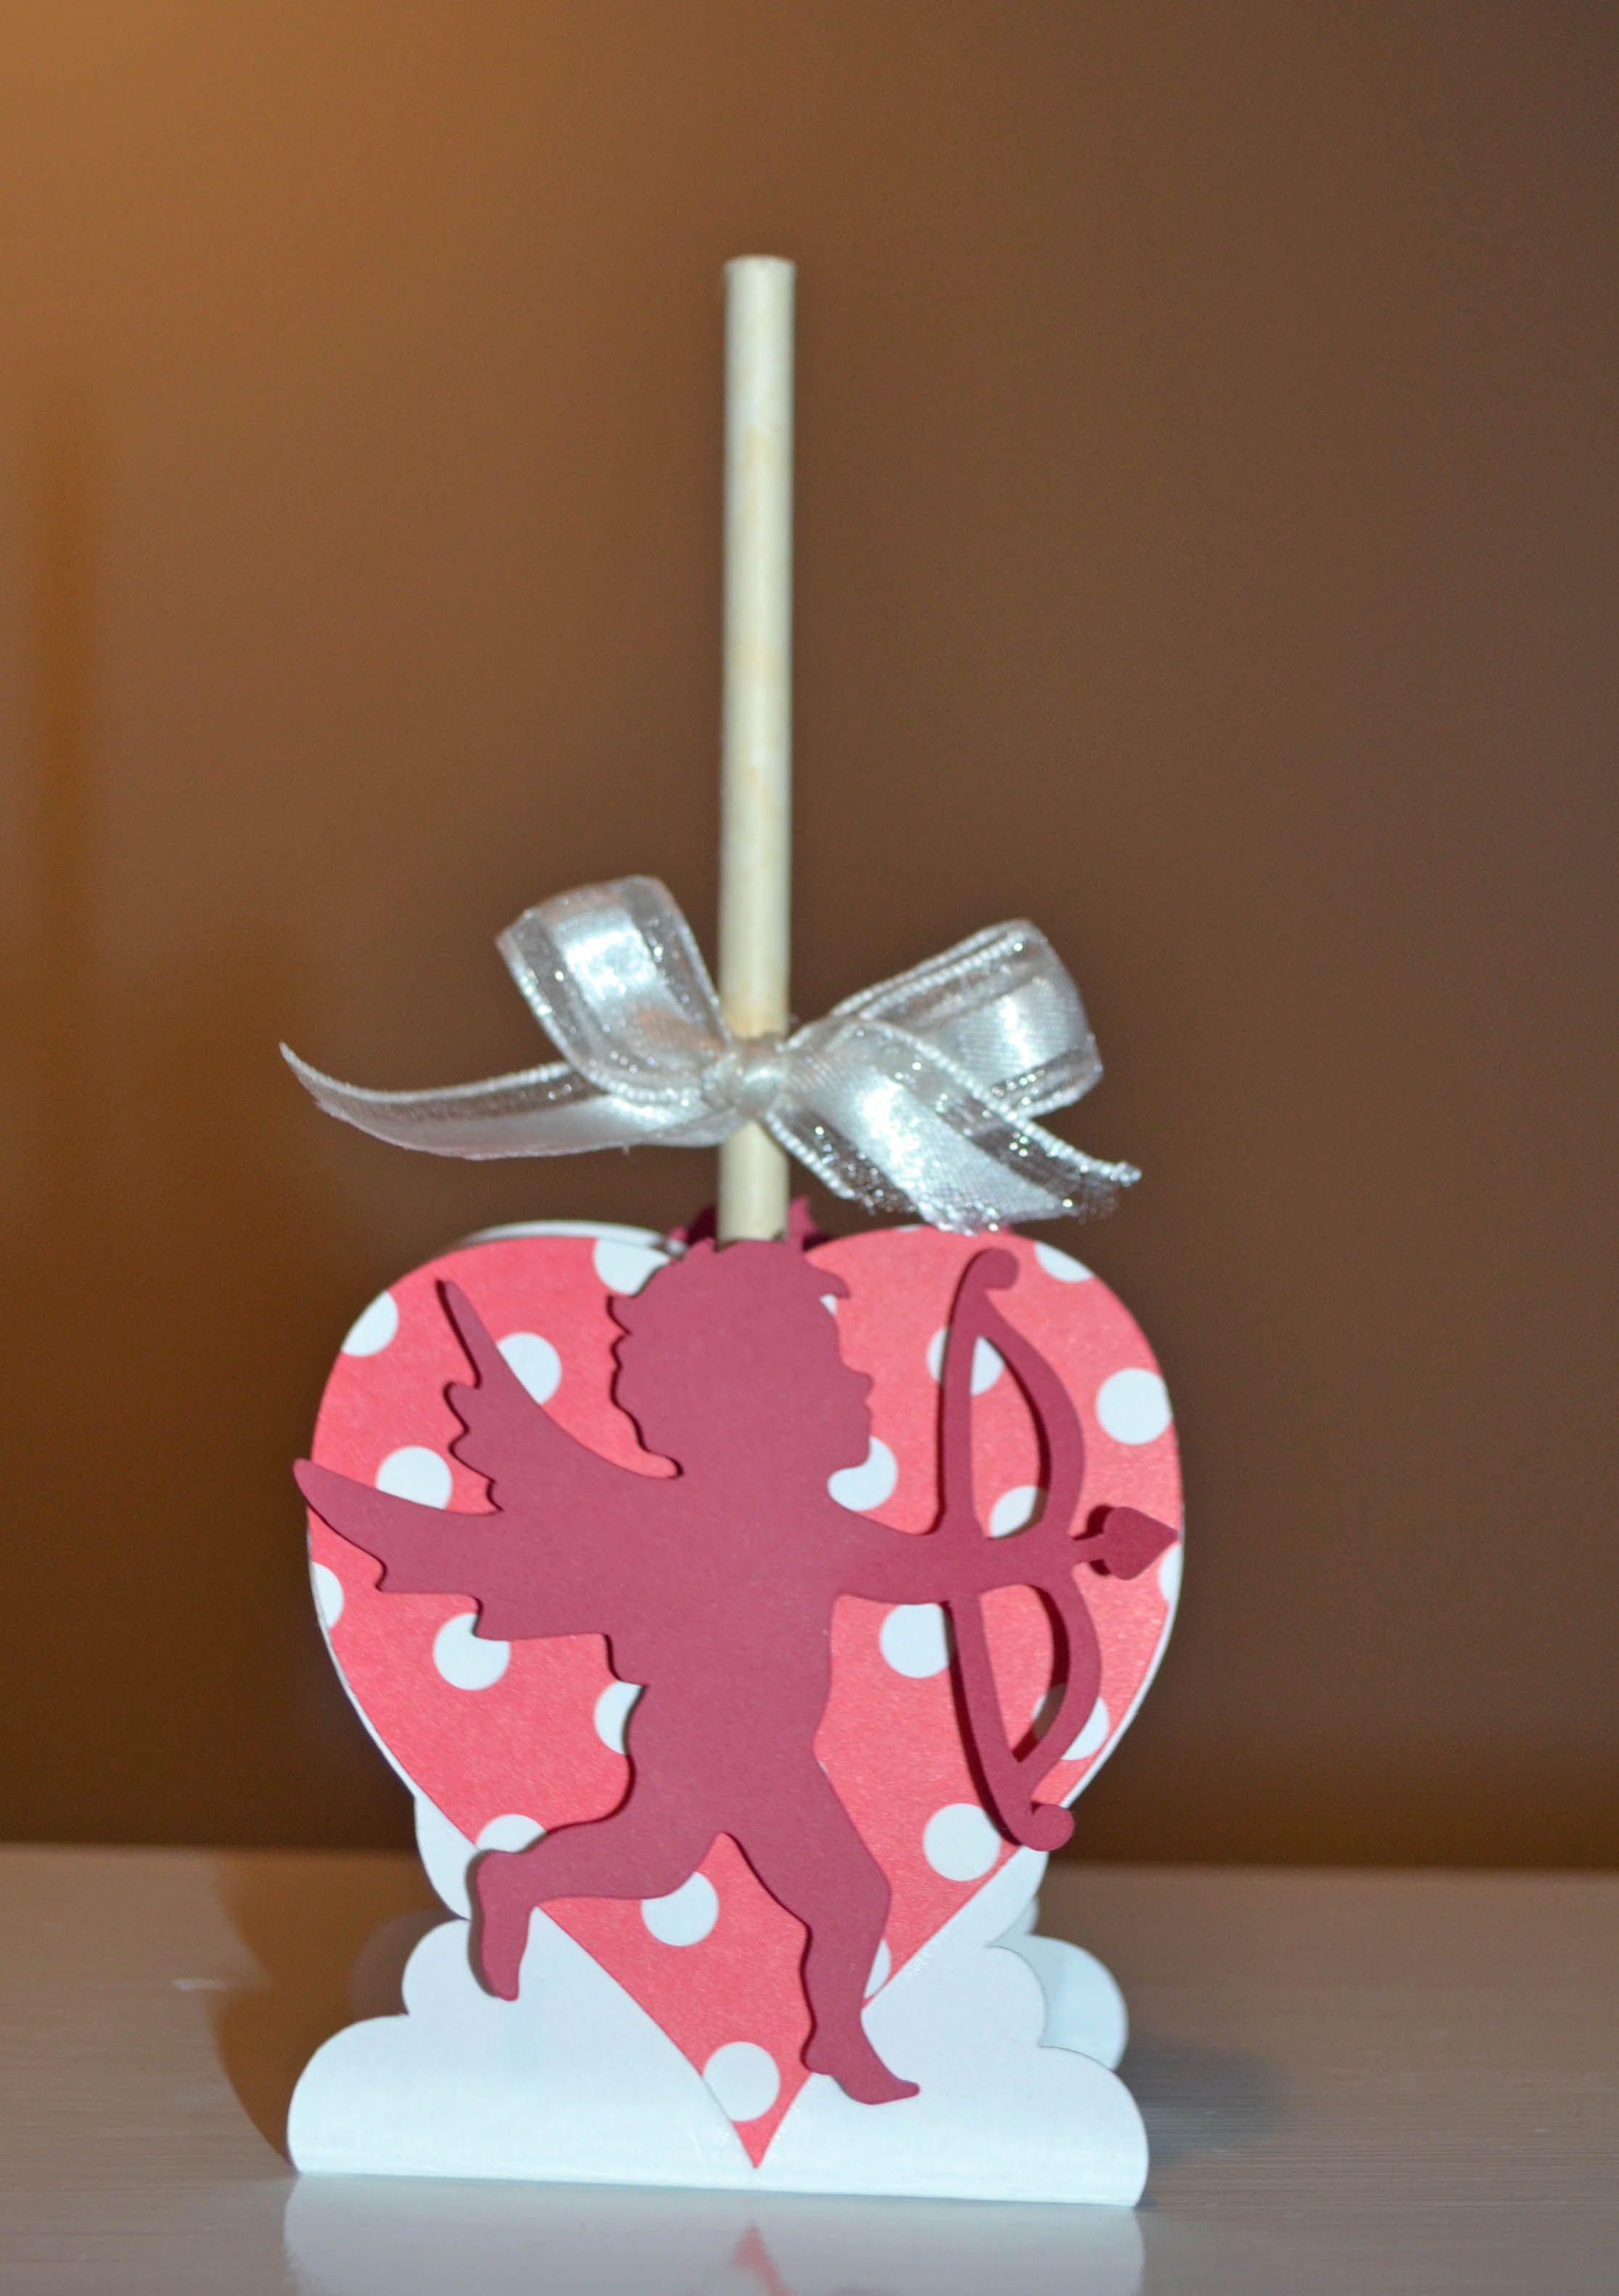 Free Dreaming Tree SVG Valentine's Lollipop Holder by me